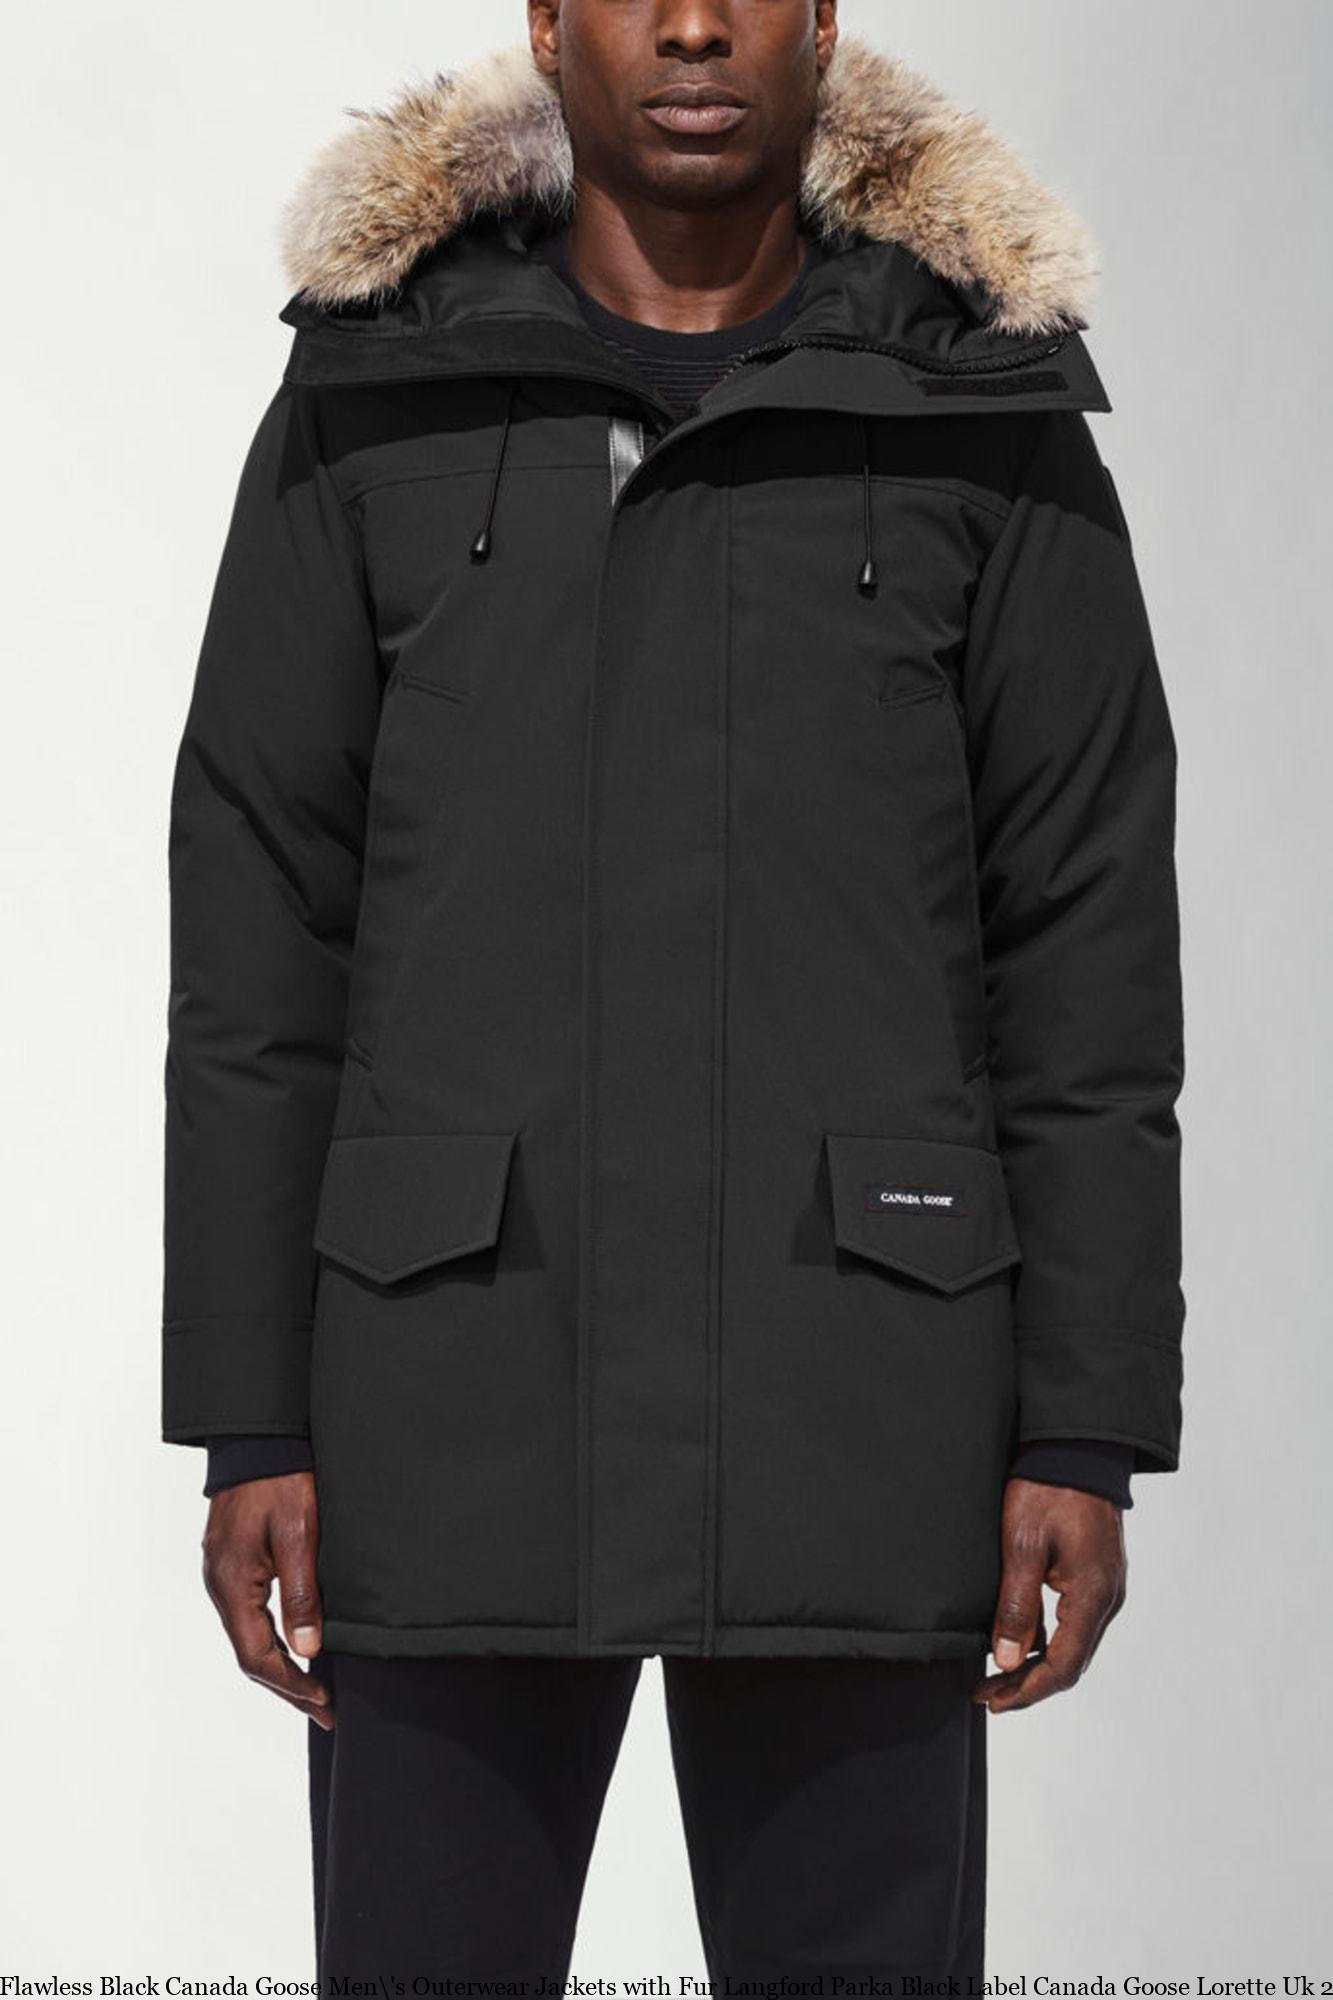 582106e23 Flawless Black Canada Goose Men\'s Outerwear Jackets with Fur Langford  Parka Black Label Canada Goose Lorette Uk 2062MB